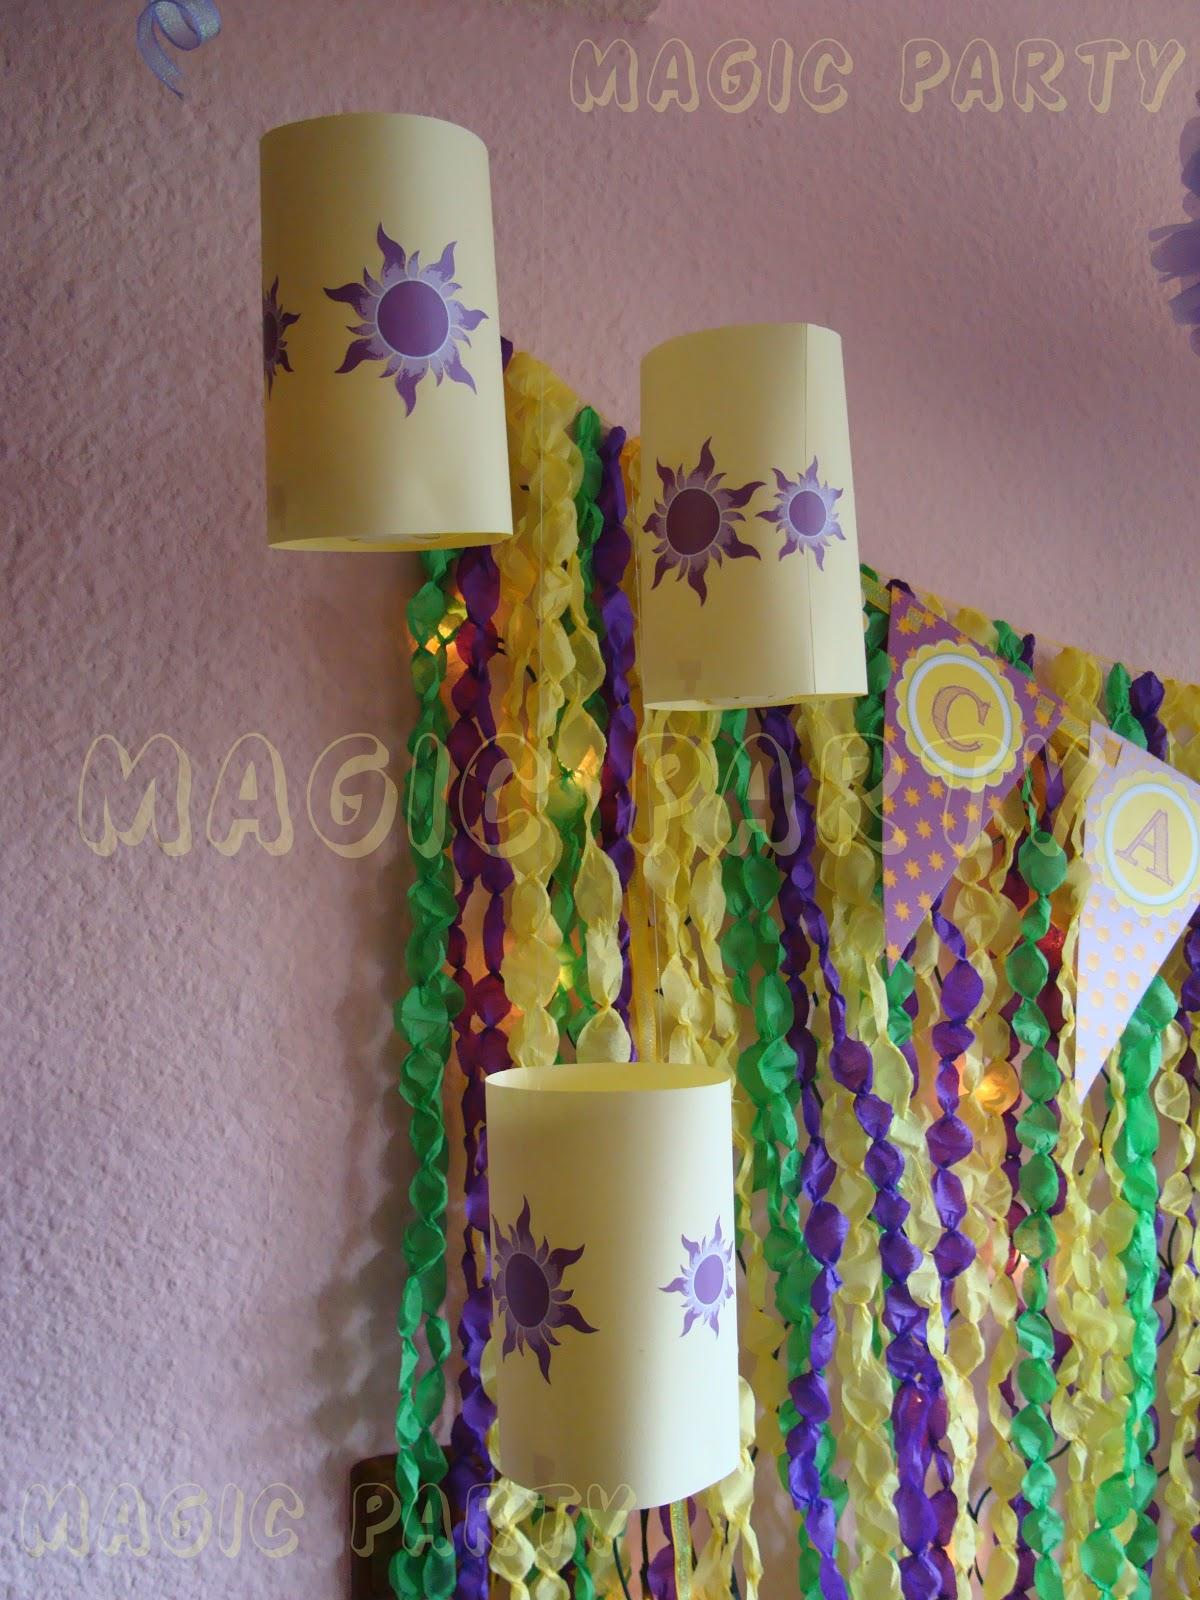 Magic Party Fiesta Enredados Candela cumple 4 aitos